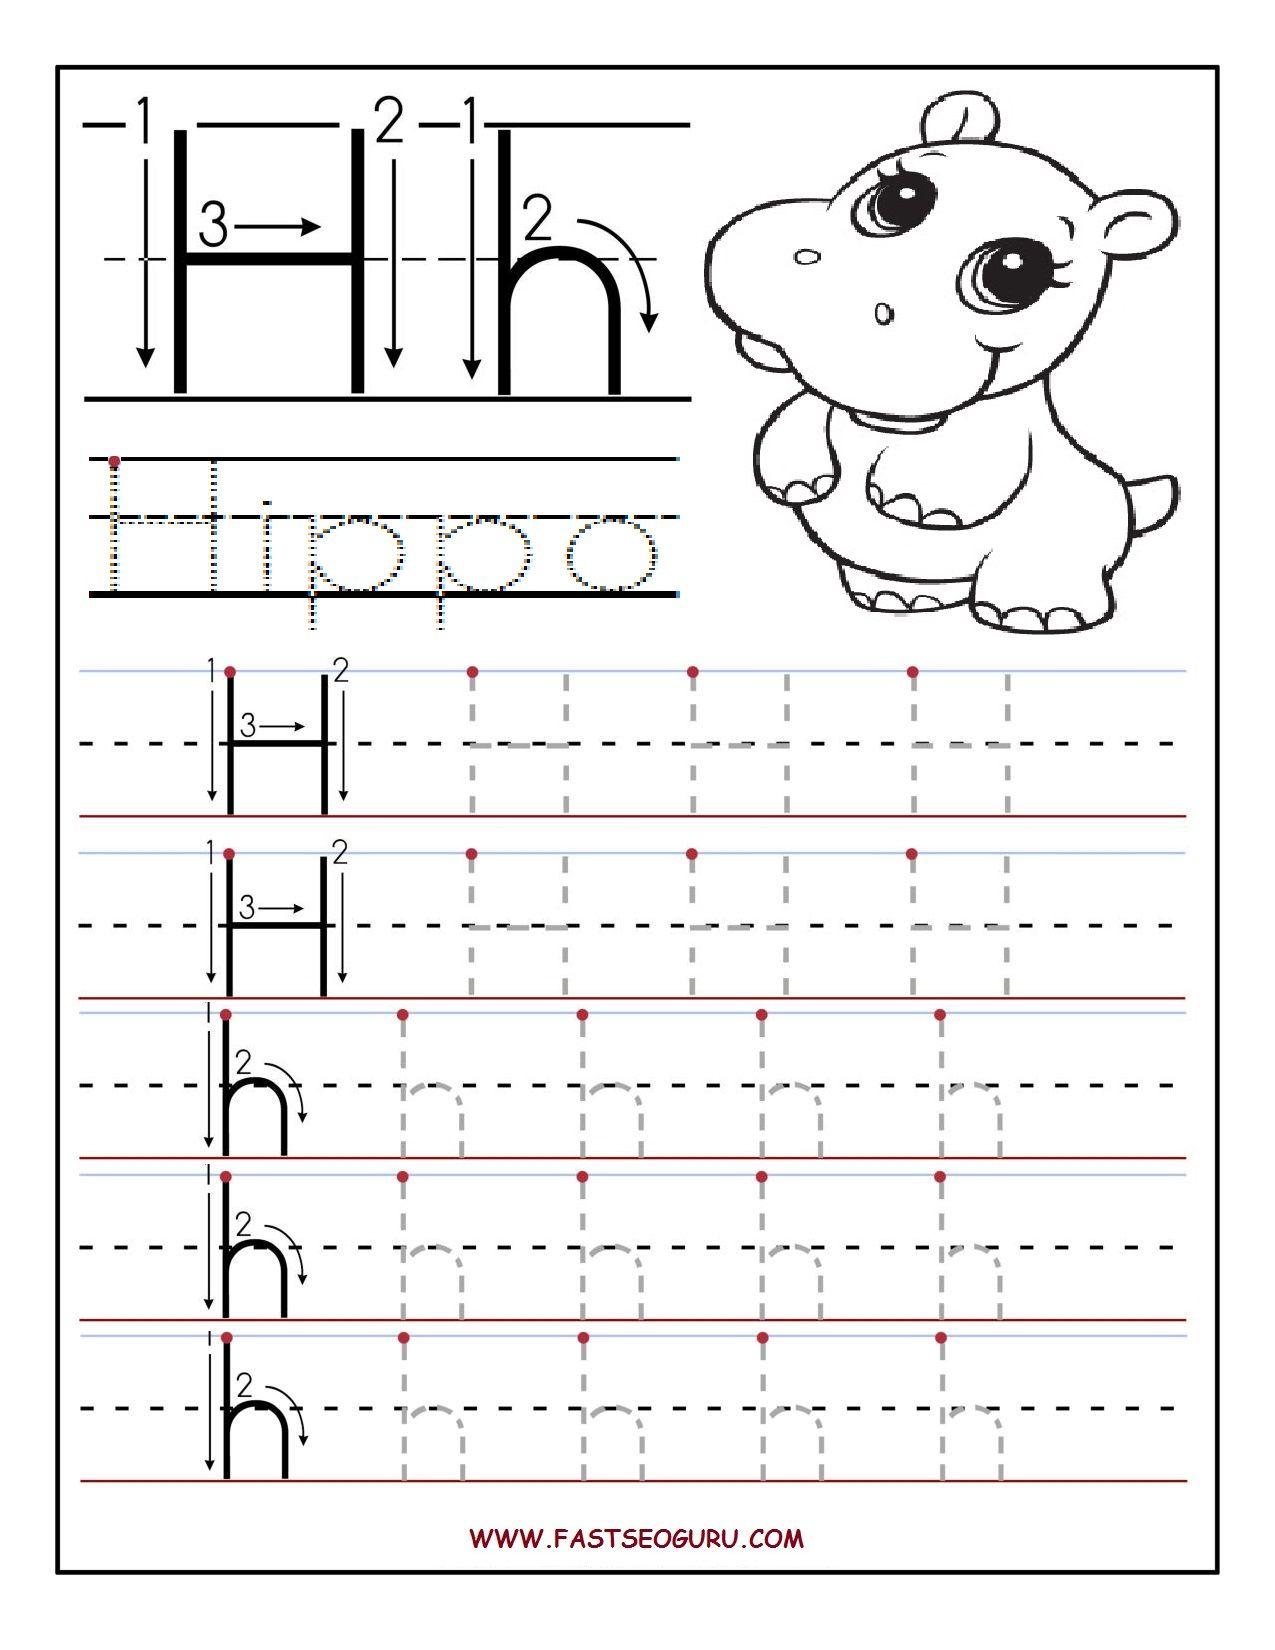 Printable Letter H Tracing Worksheets For Preschool